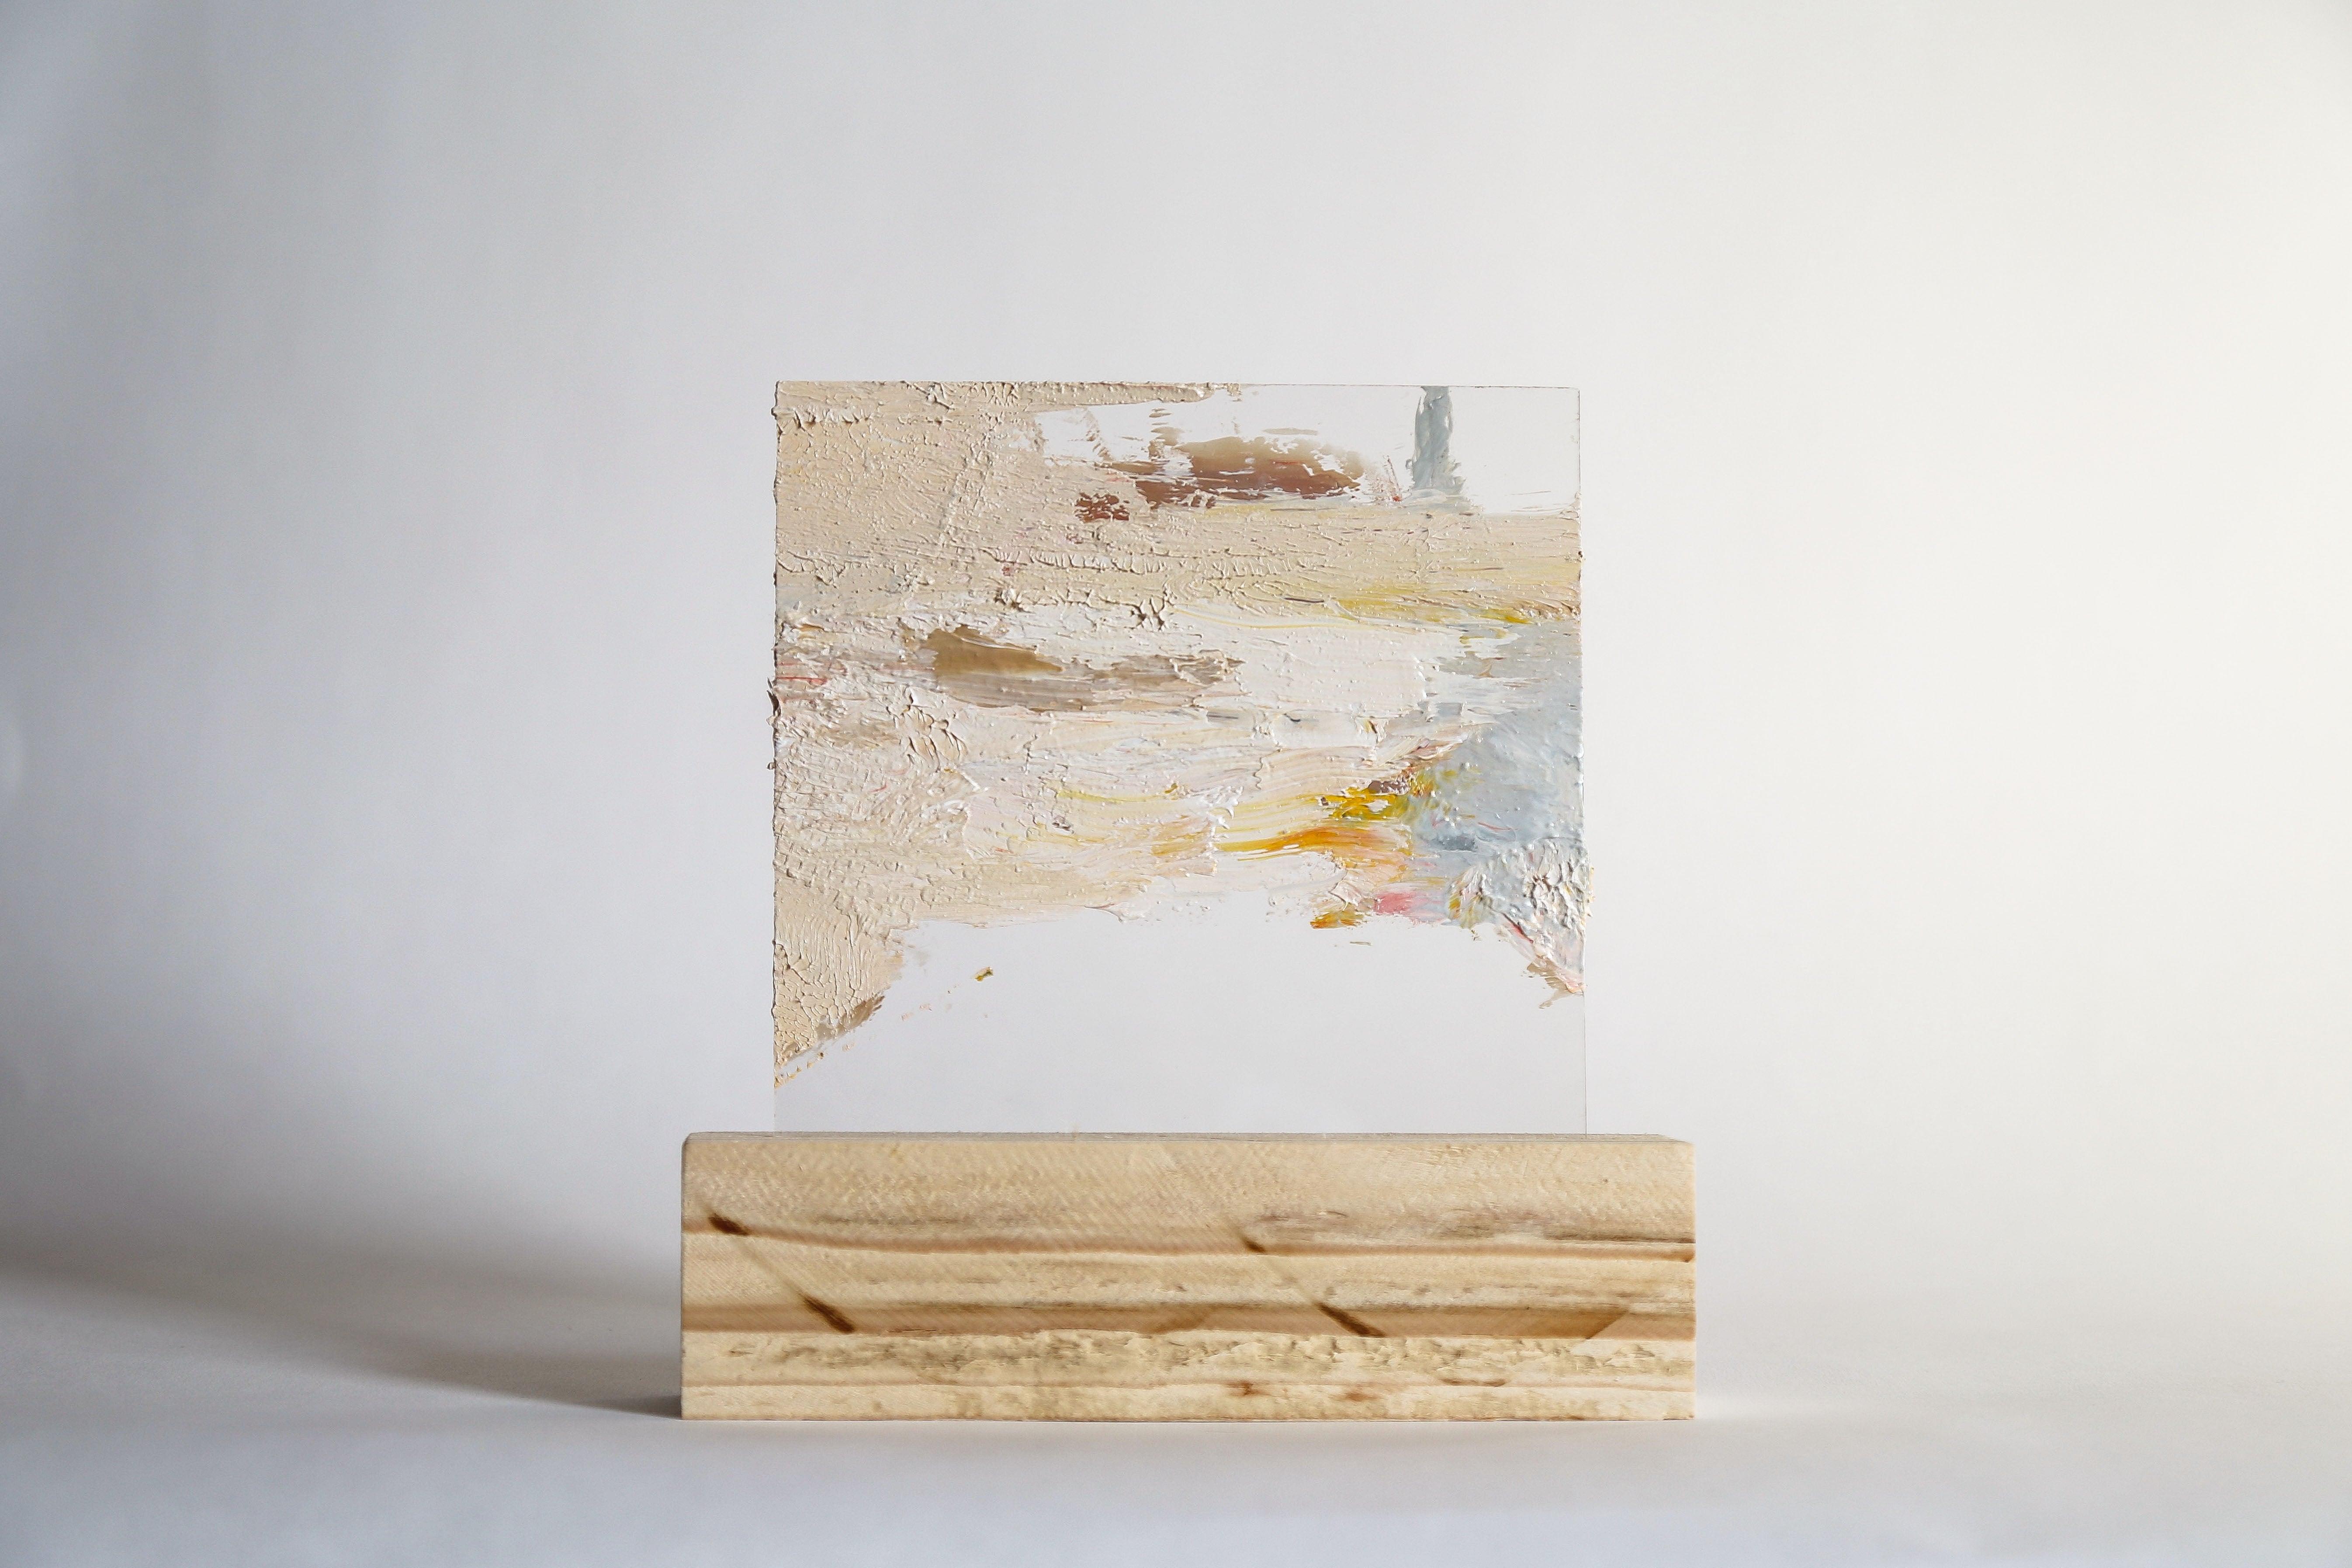 Lourdes Rivera, Retrospect 6, 2015, Oil Paint, Plexiglass, Wood